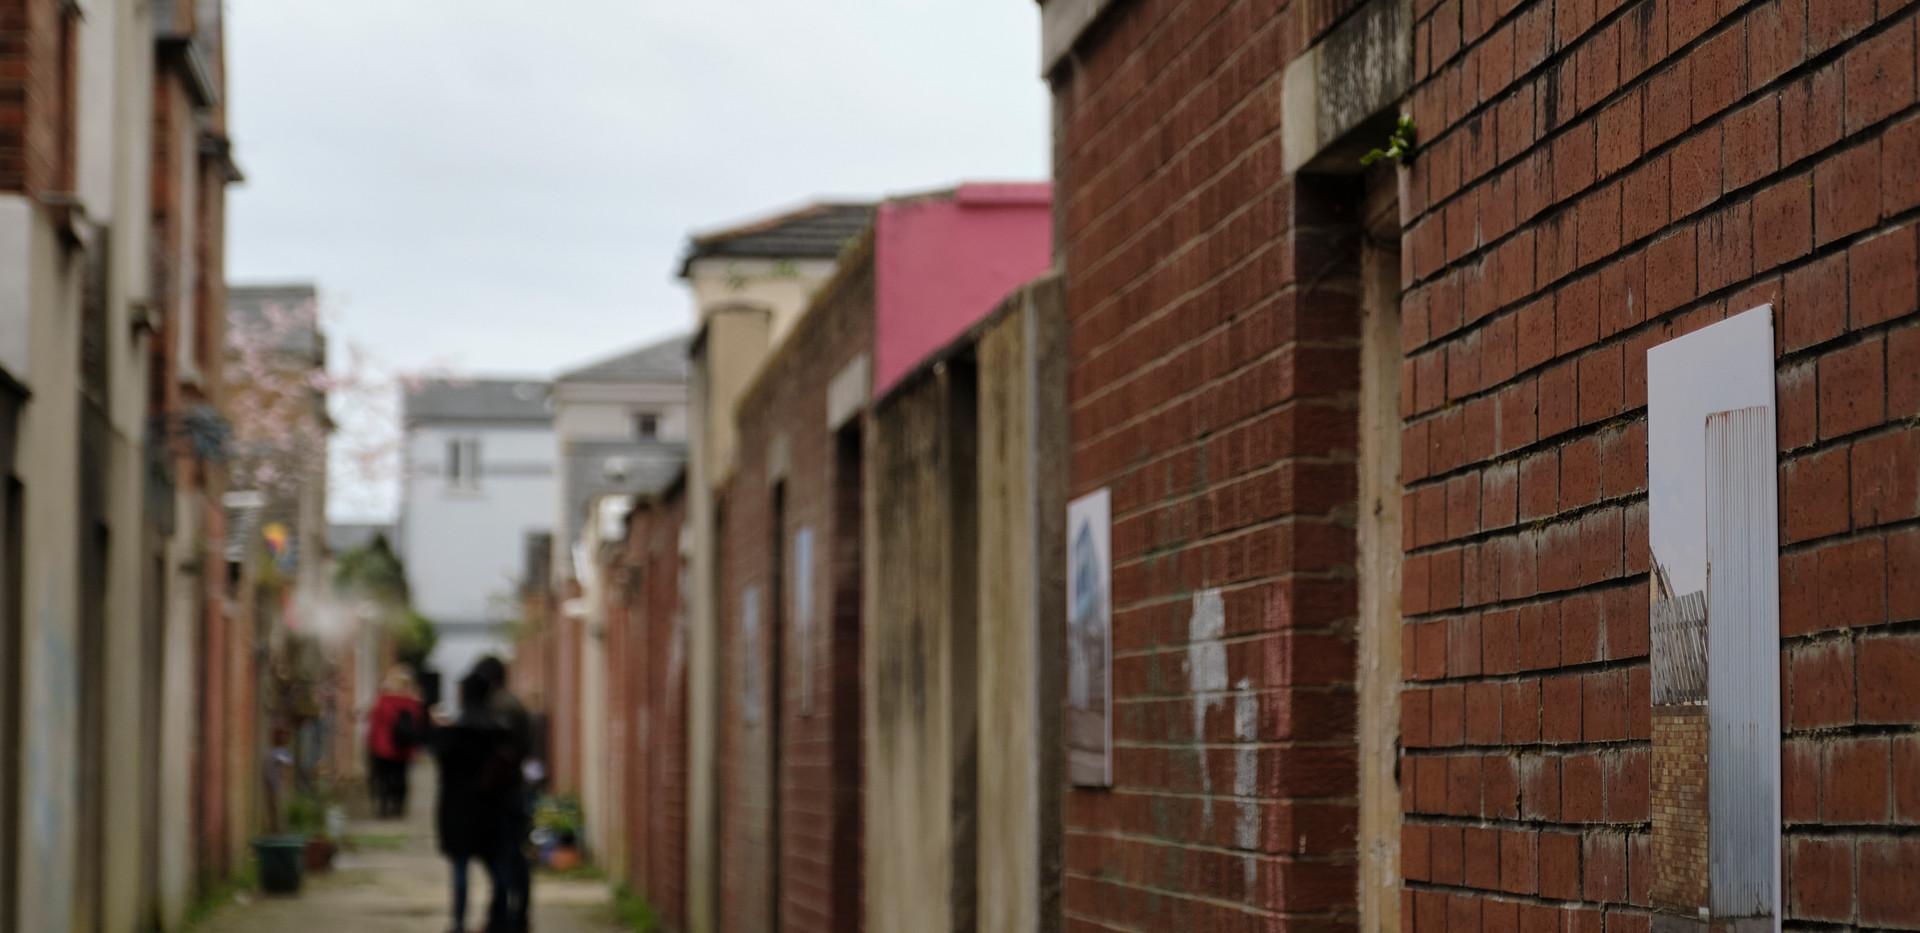 20210325 Limin Alley 365.jpg